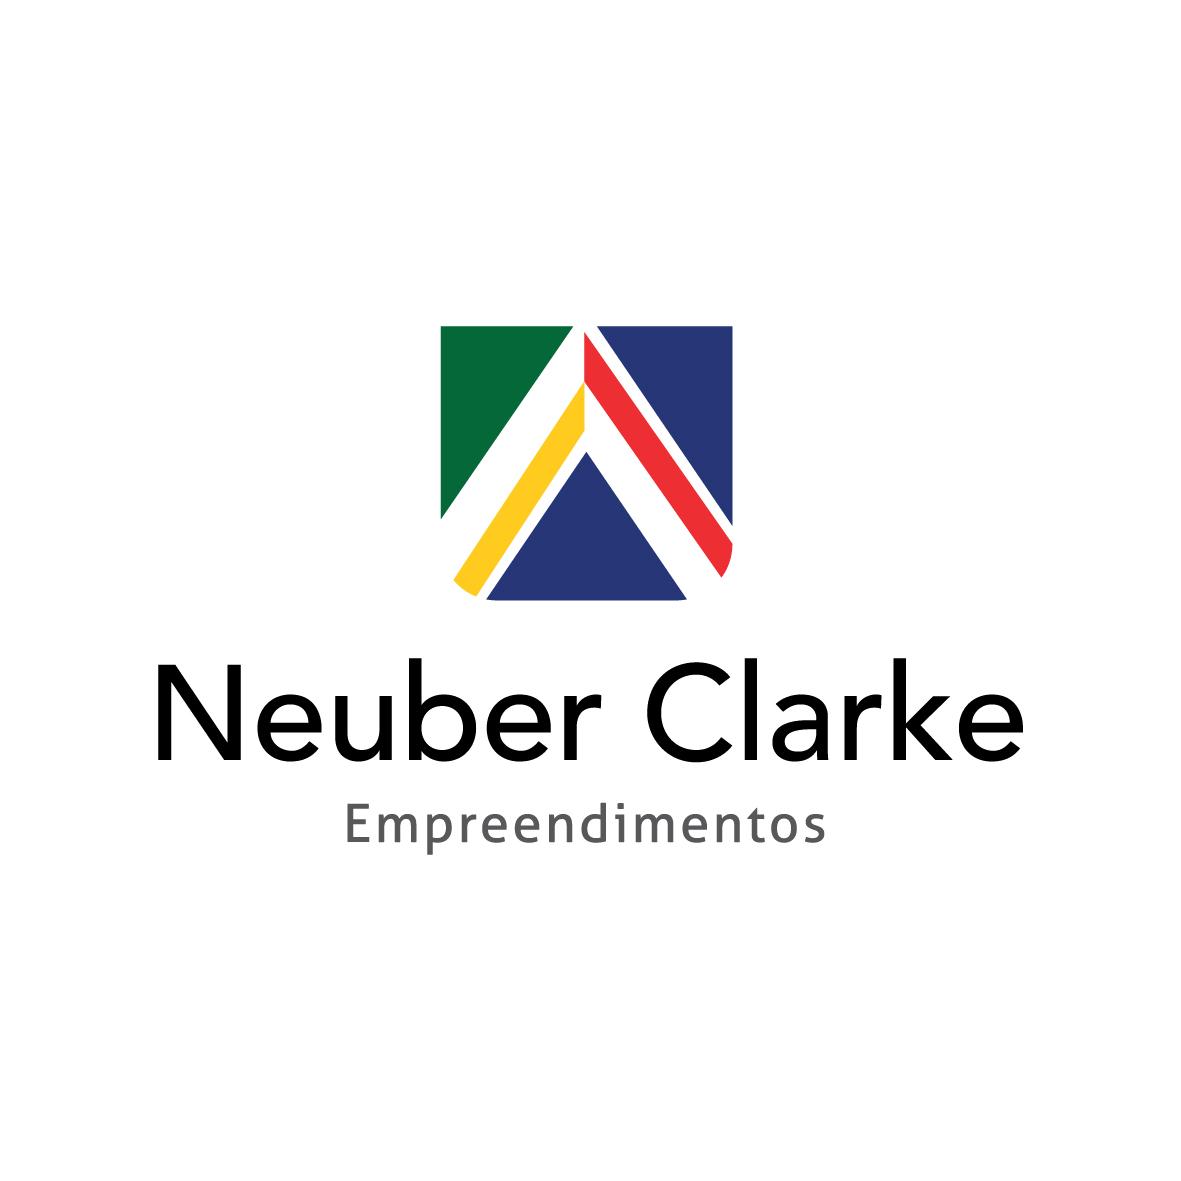 NEUBER CLARKE - LOGO